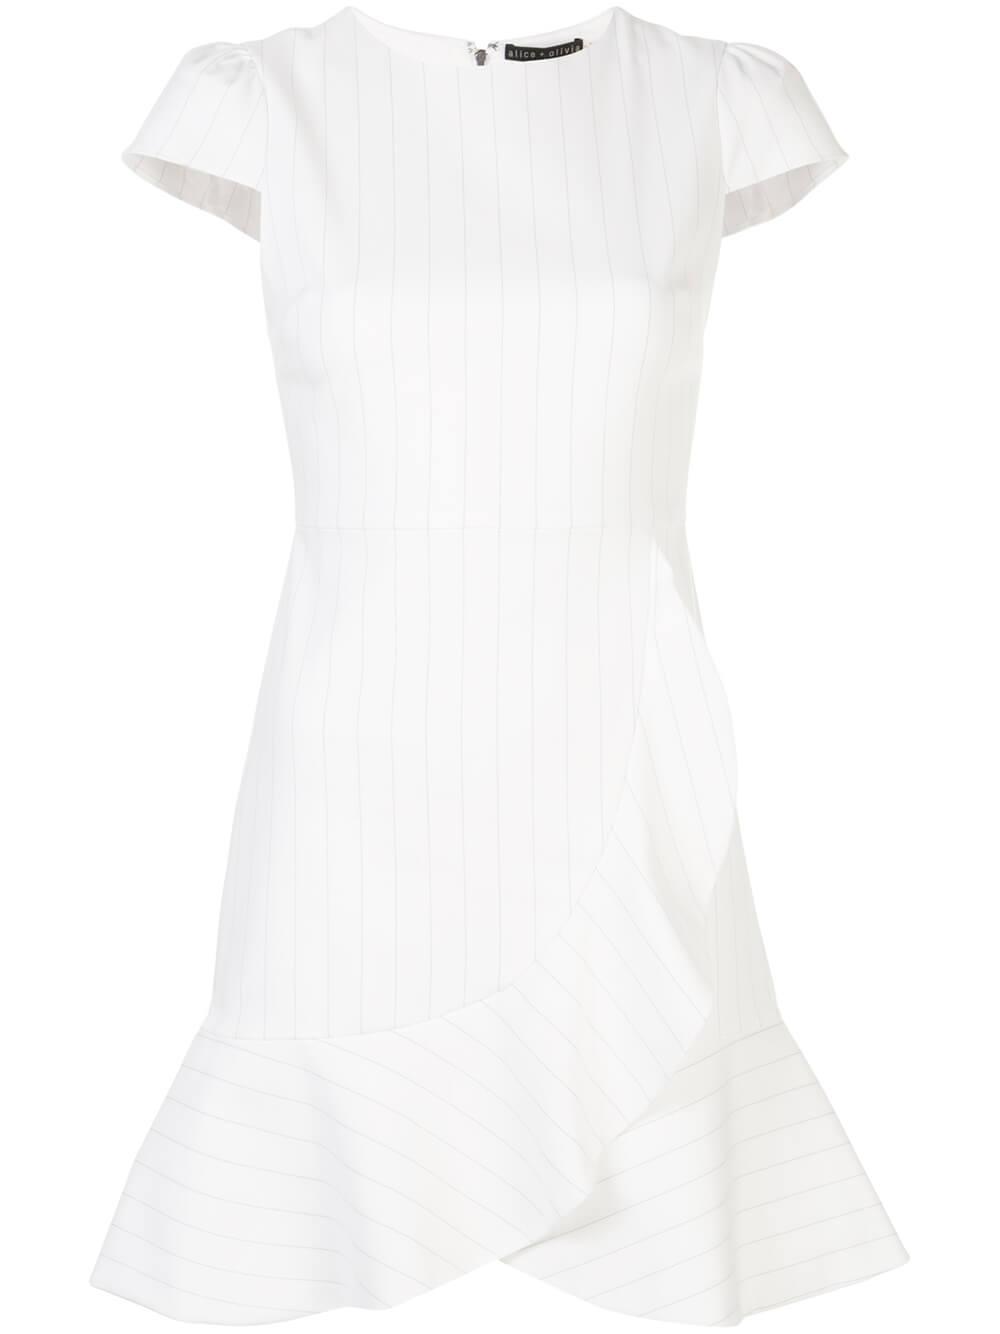 Kirby Stripe Ruffle Short Sleeve Dress